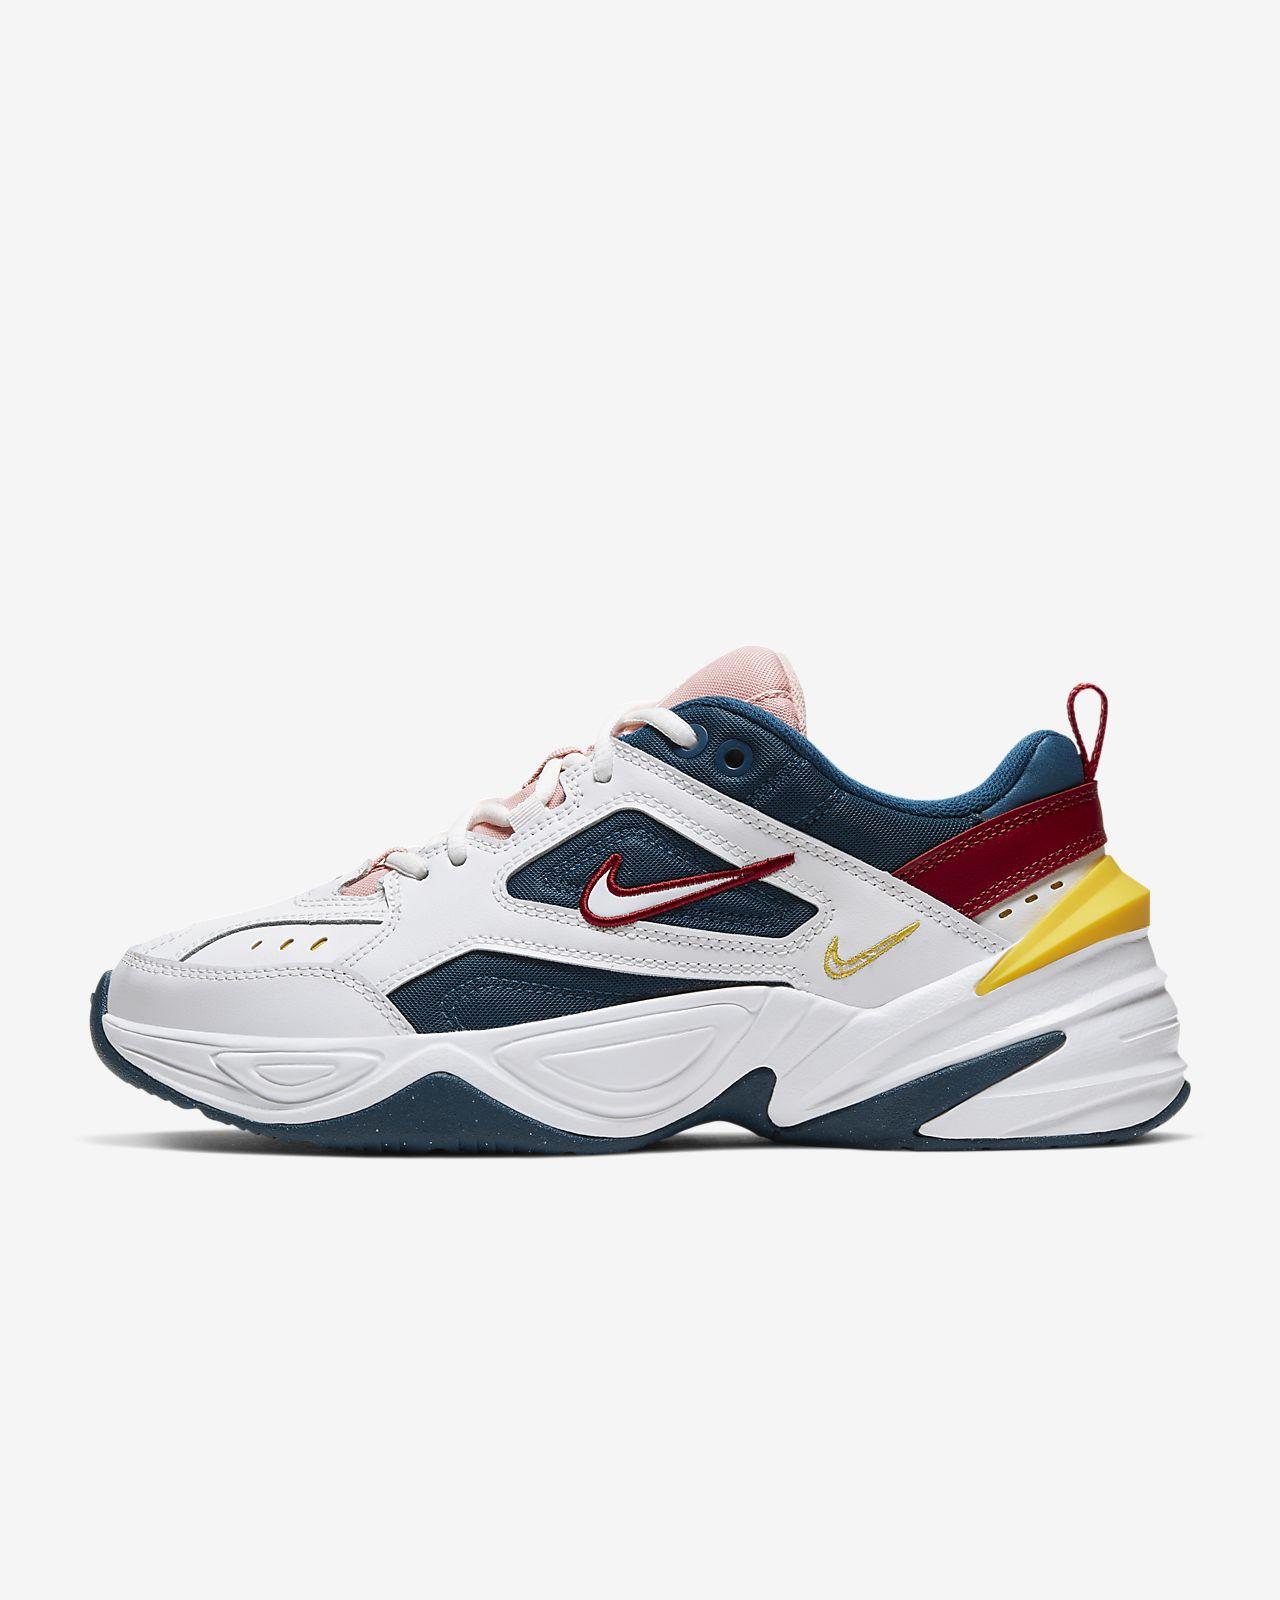 amazing price great deals 2017 great deals Nike M2K Tekno Shoe